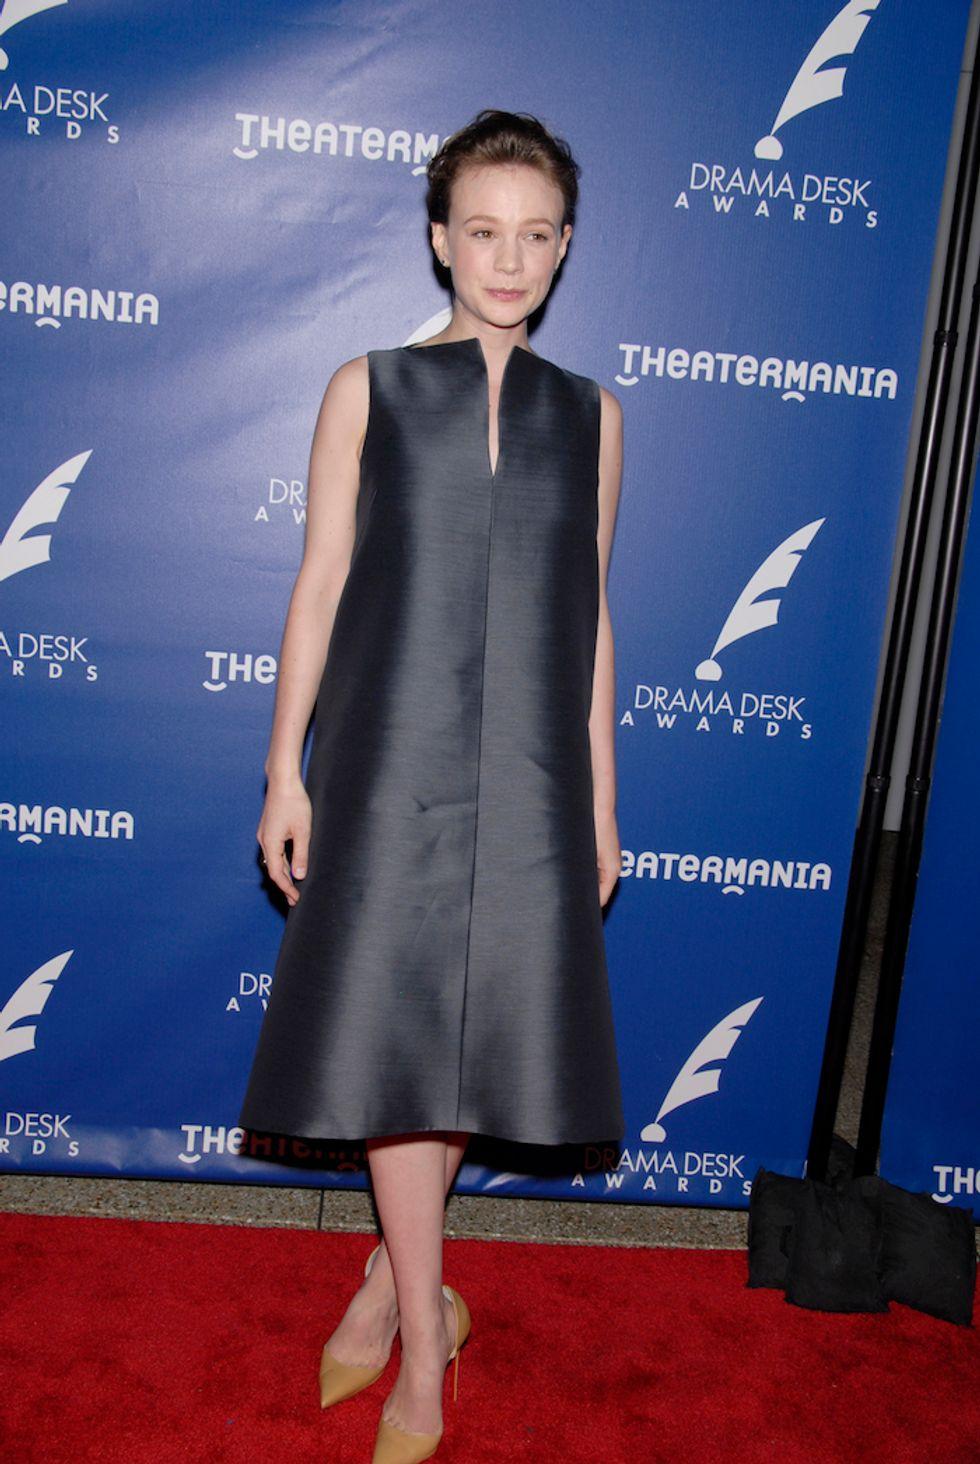 The Drama Desk Awards with Photographer Gary Lee Boas